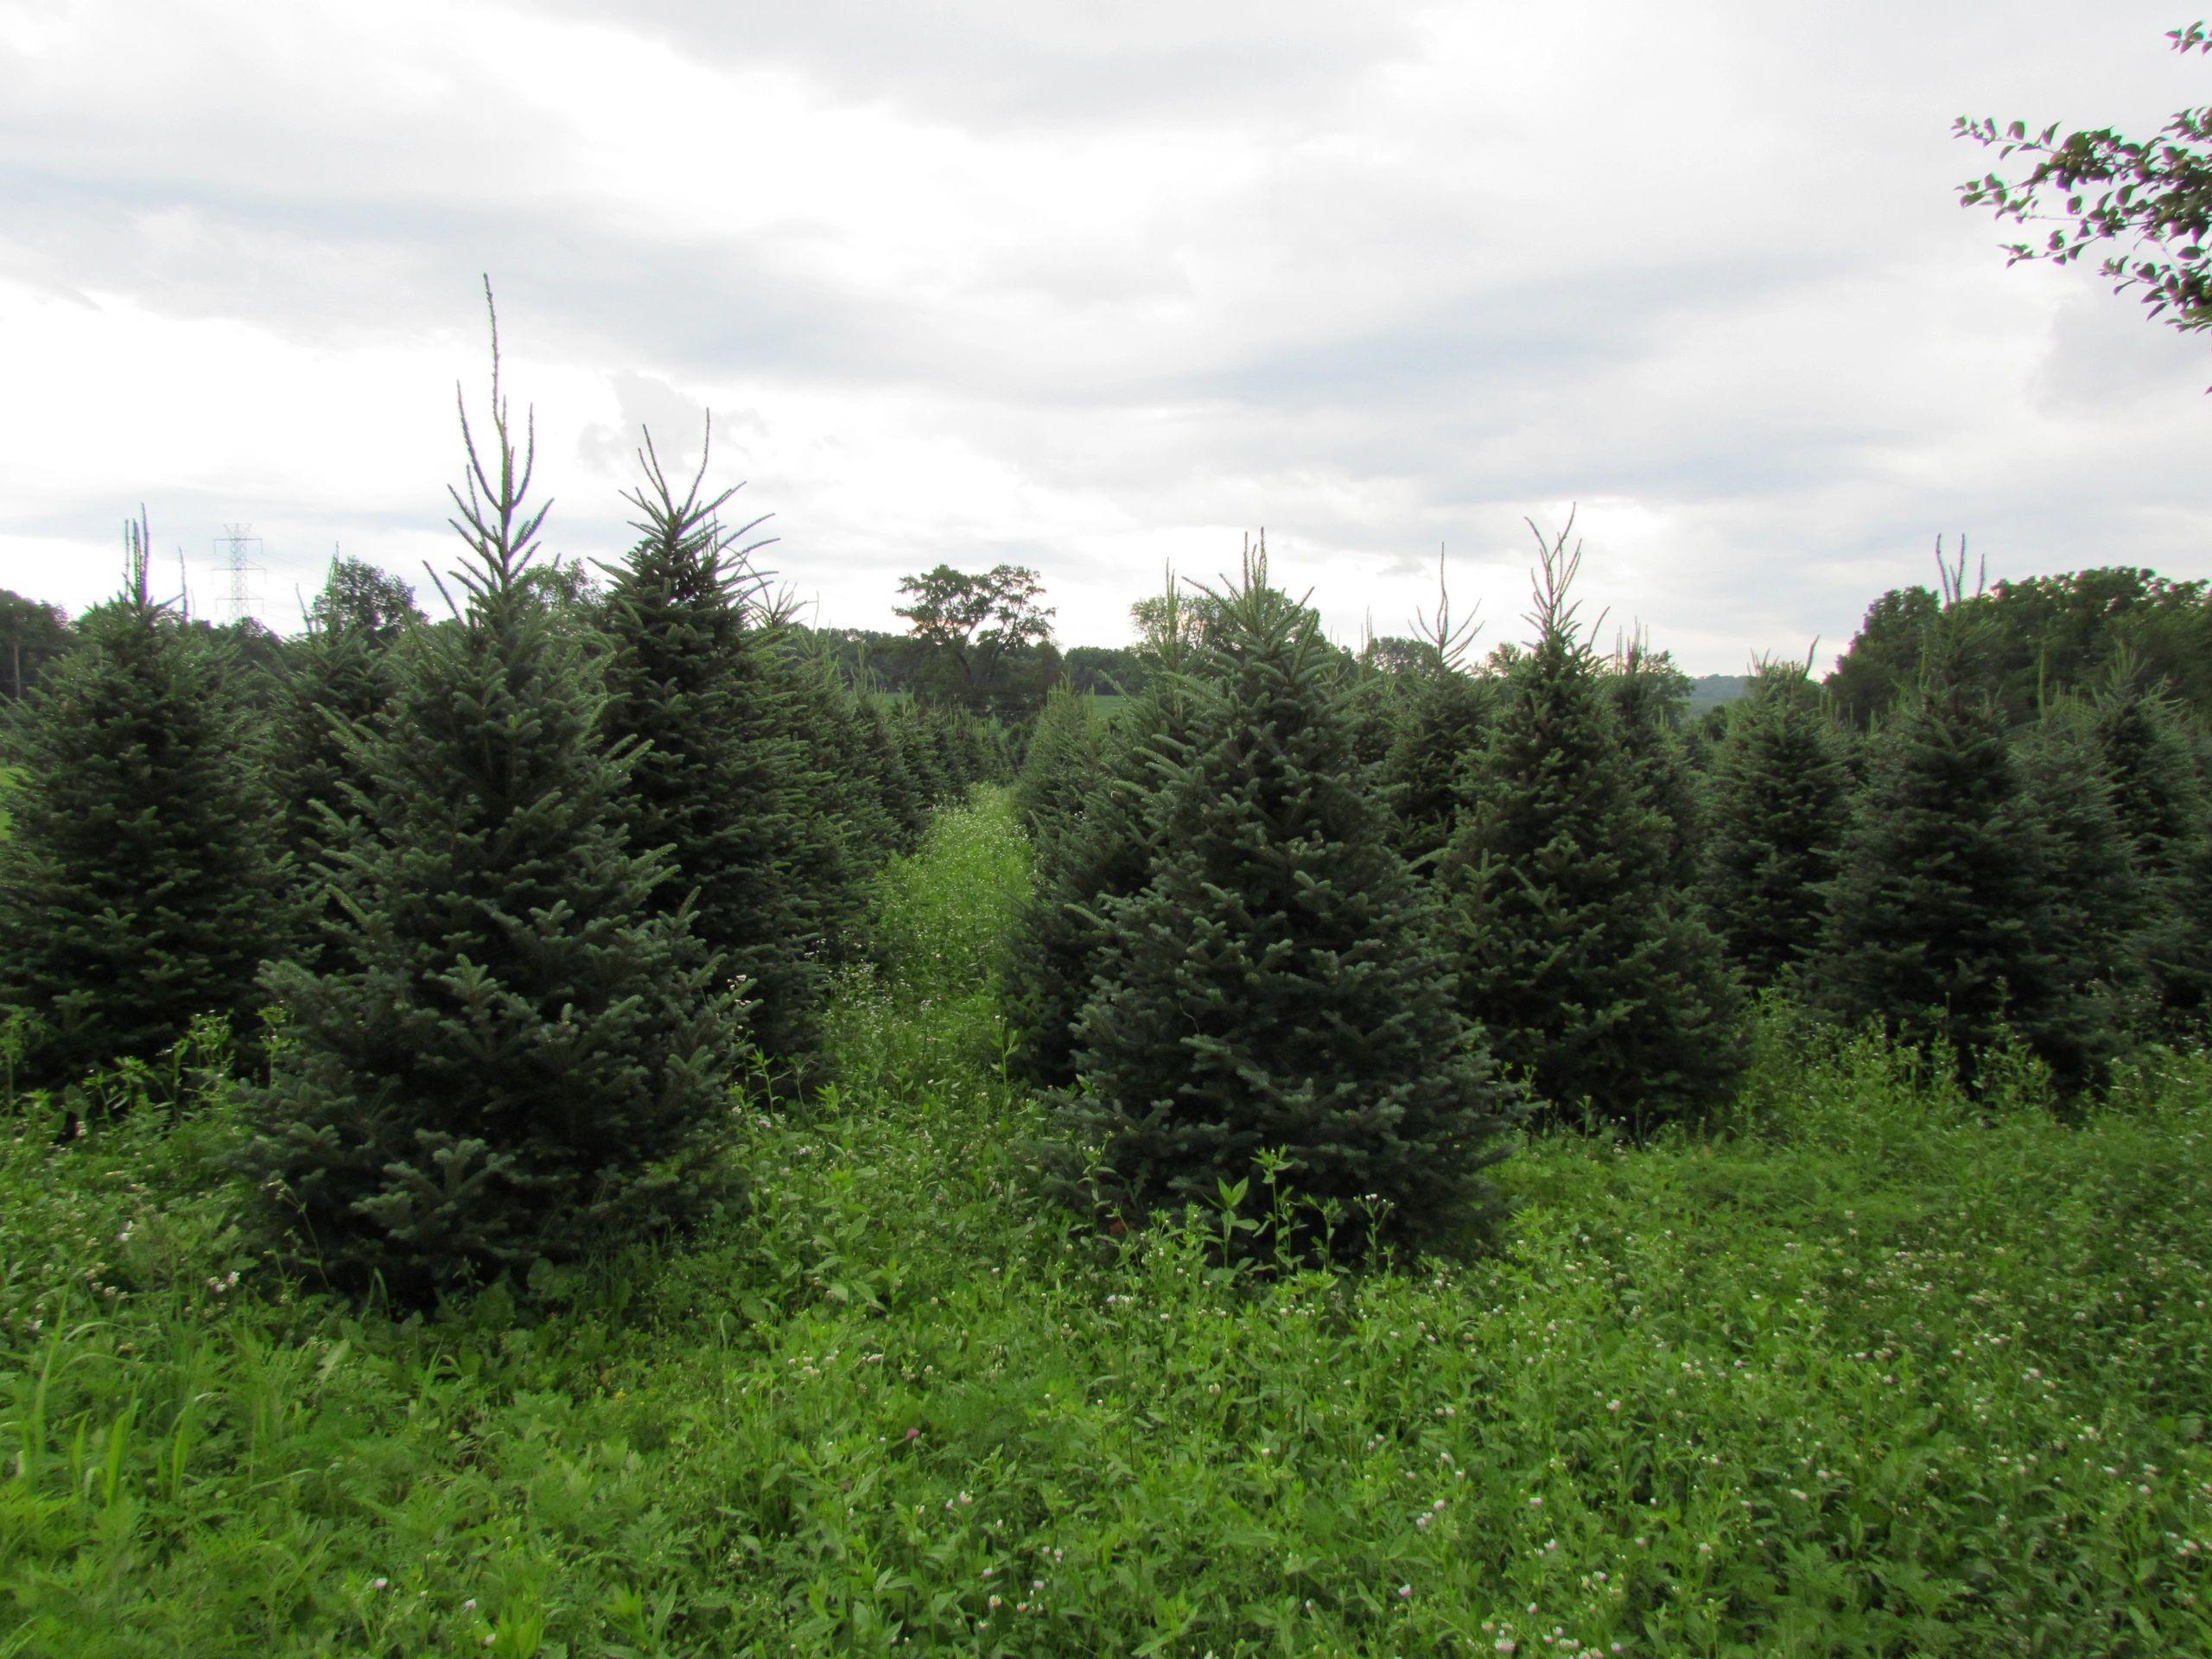 Triple Creek Farm and Nursery - Christmas Trees, Nursery, Tree Farm